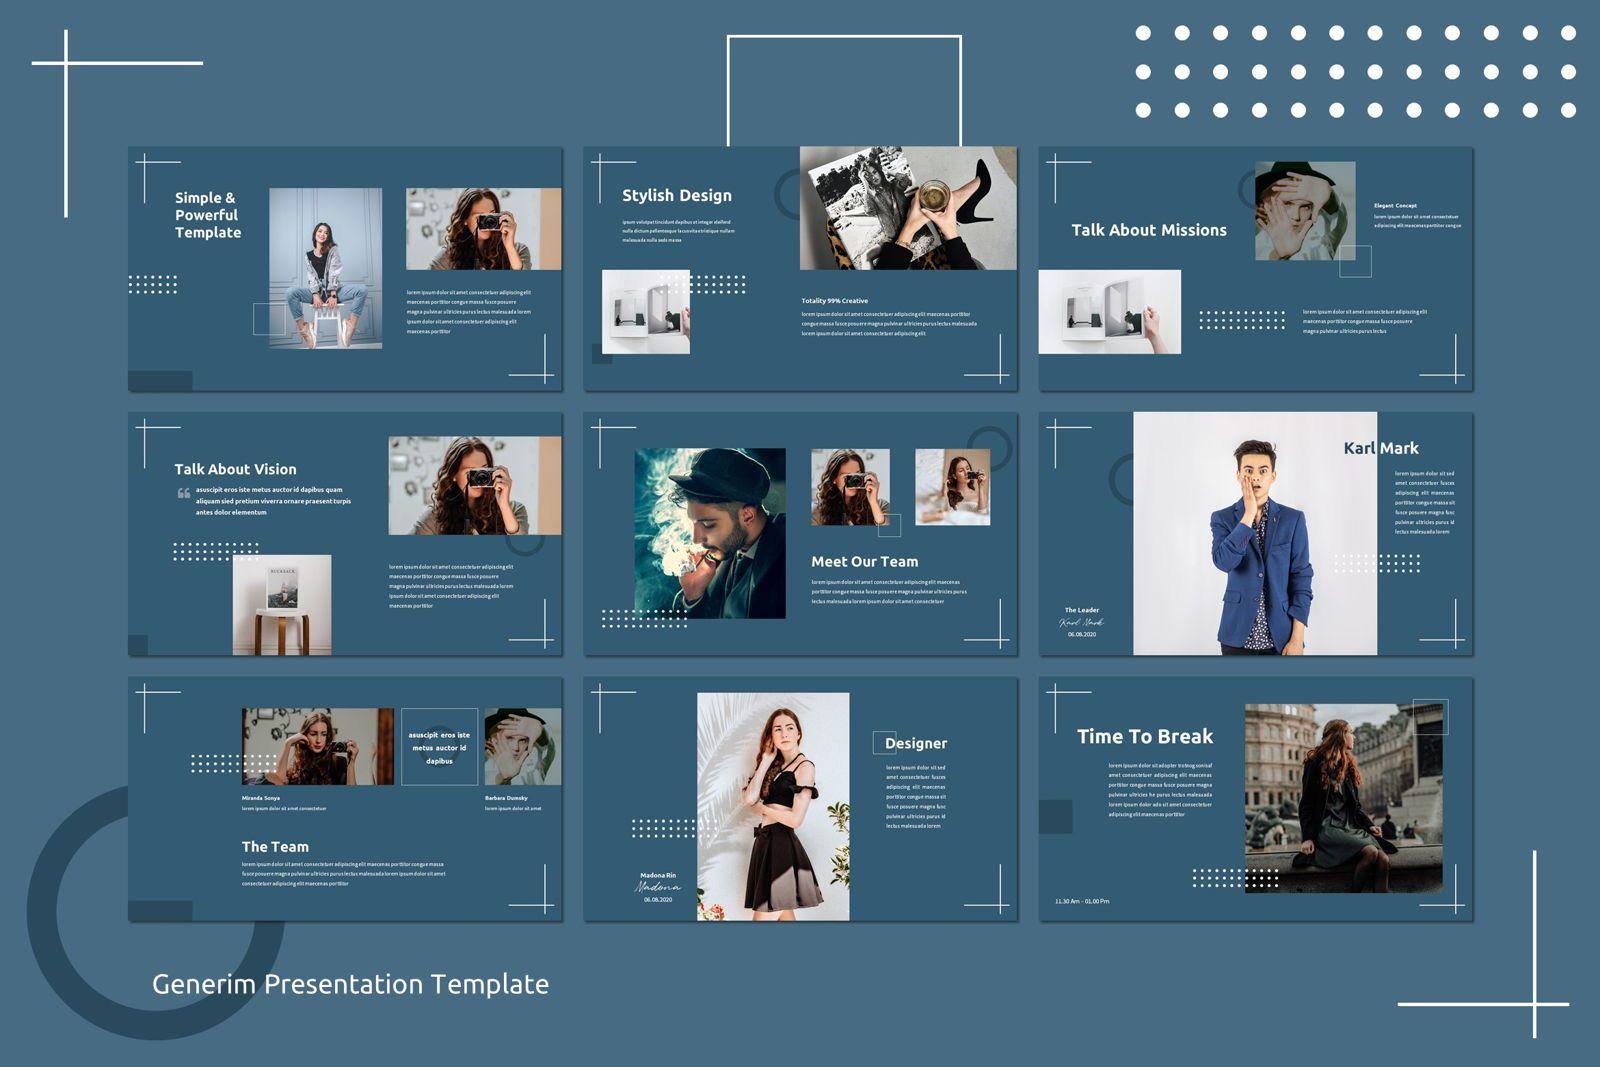 Generim - Powerpoint Template, Slide 3, 07773, Presentation Templates — PoweredTemplate.com